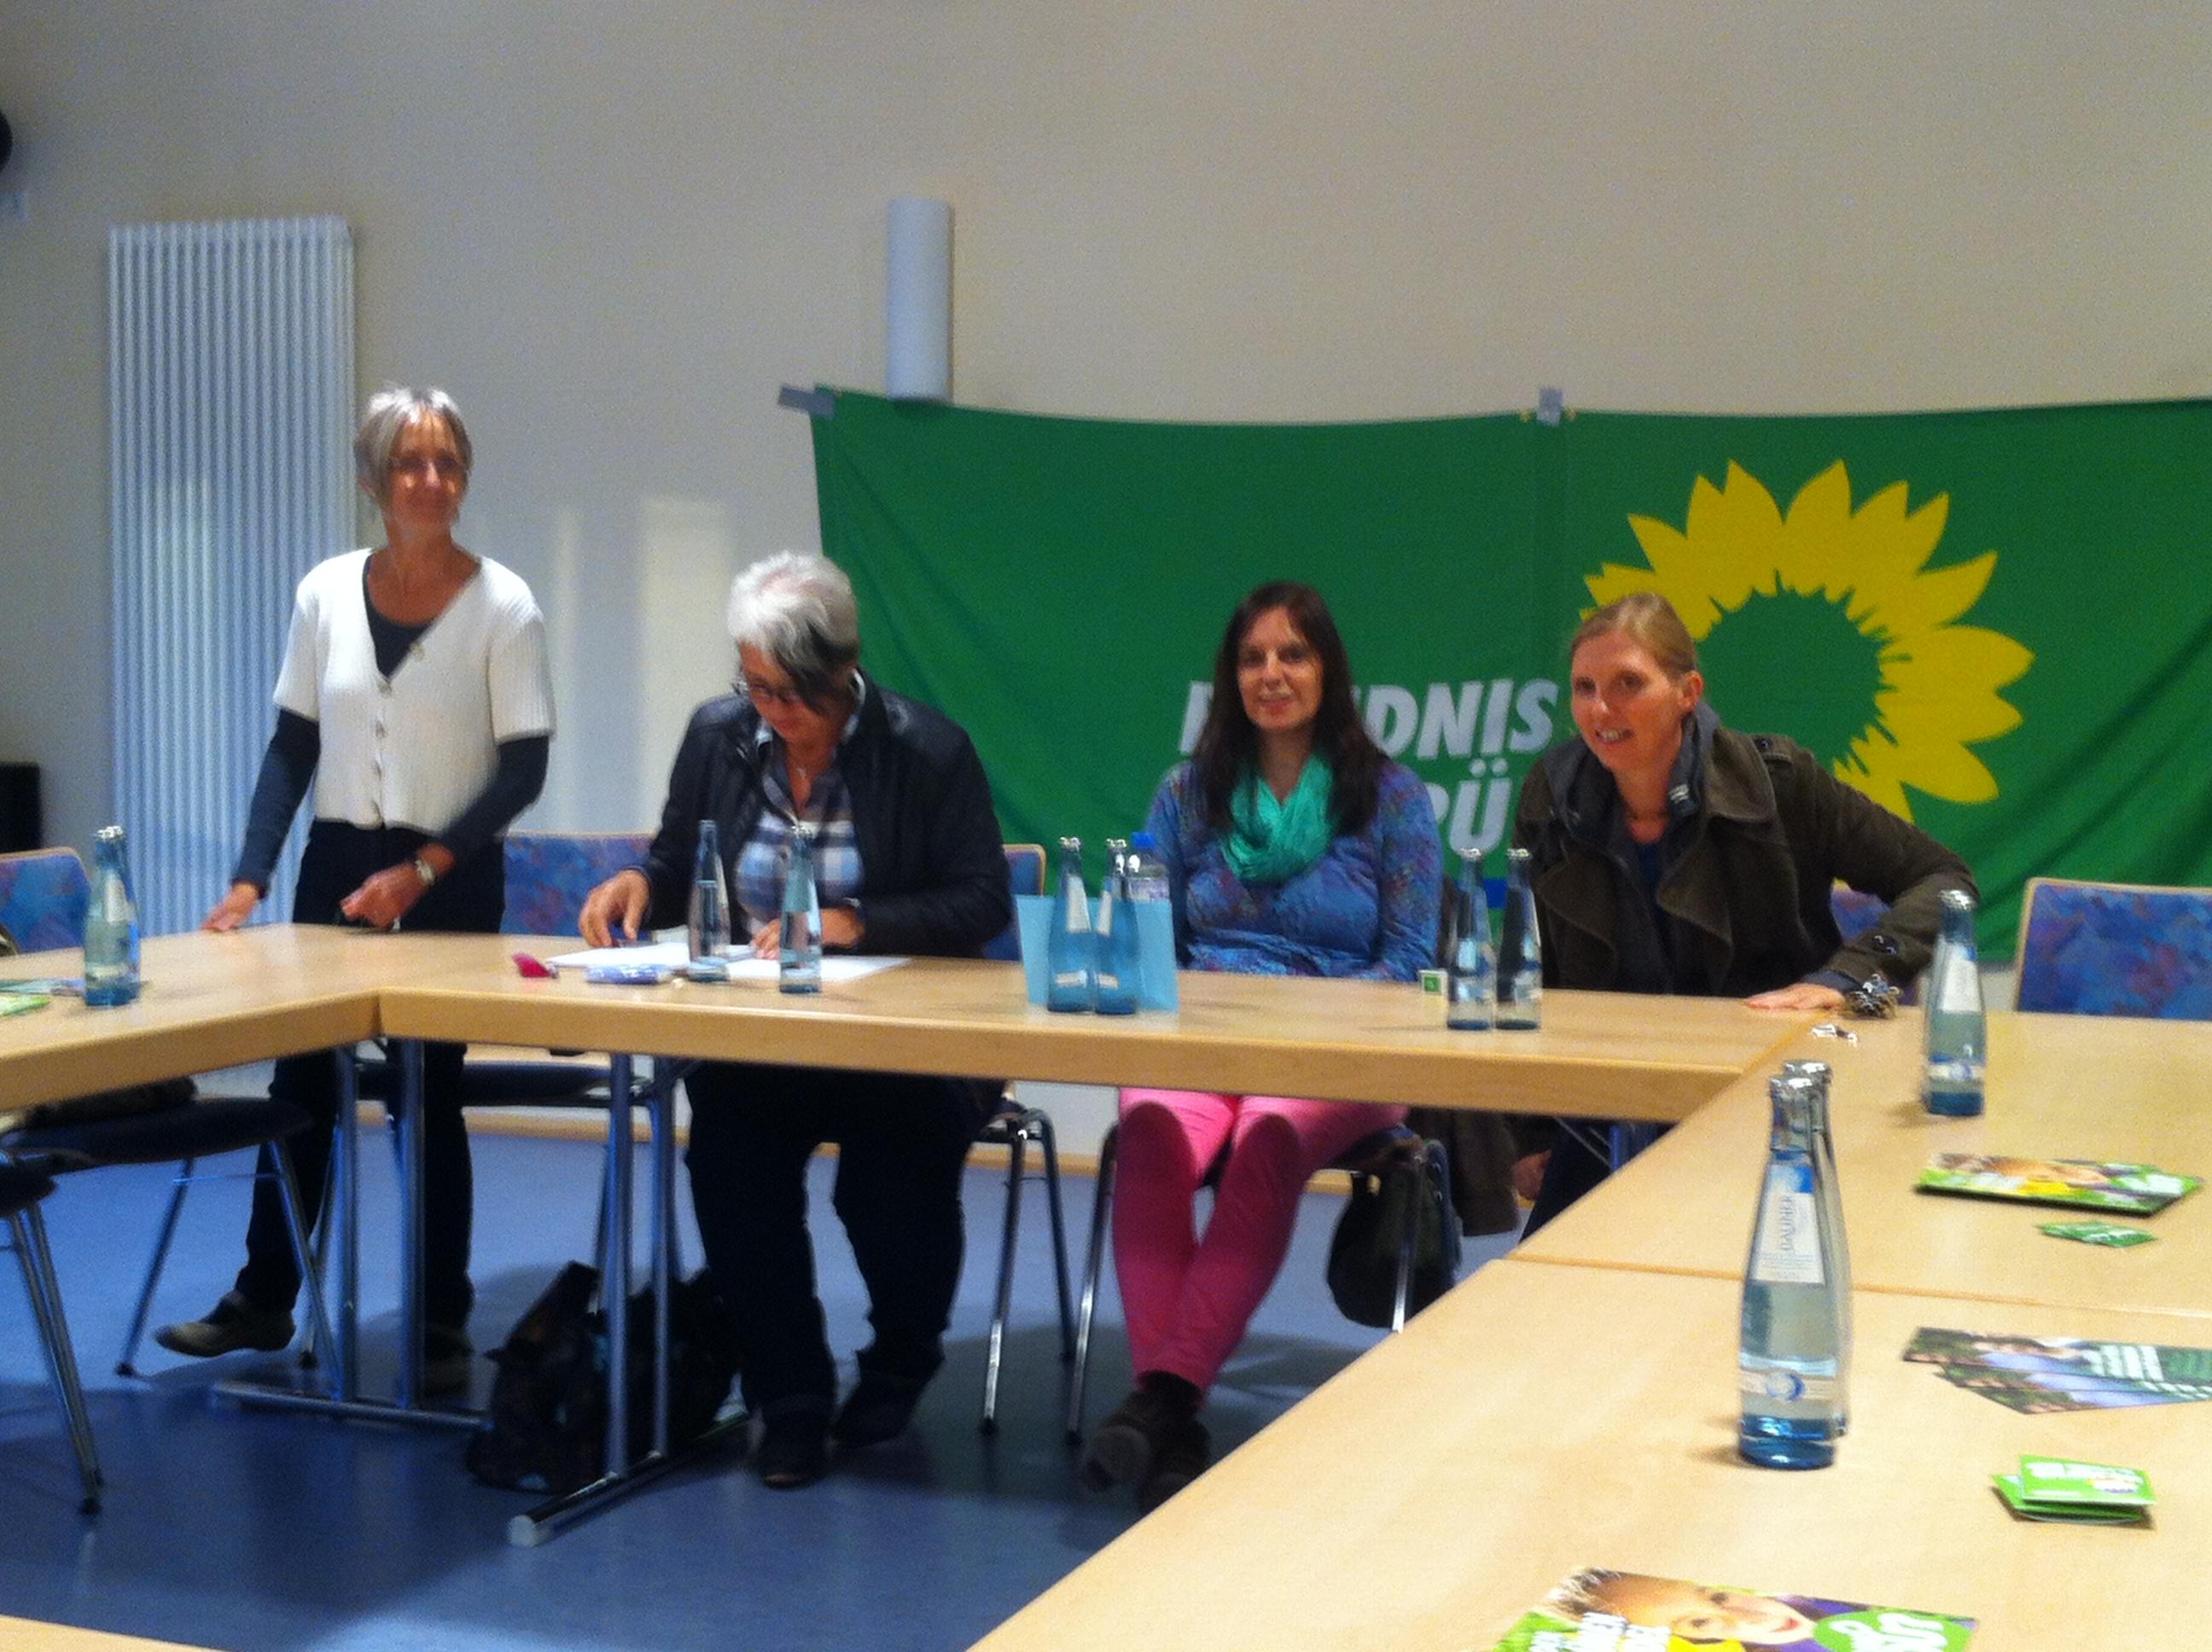 Thersia Utters, Doris Rücker, Leonie Faber, Corinna Rüffer